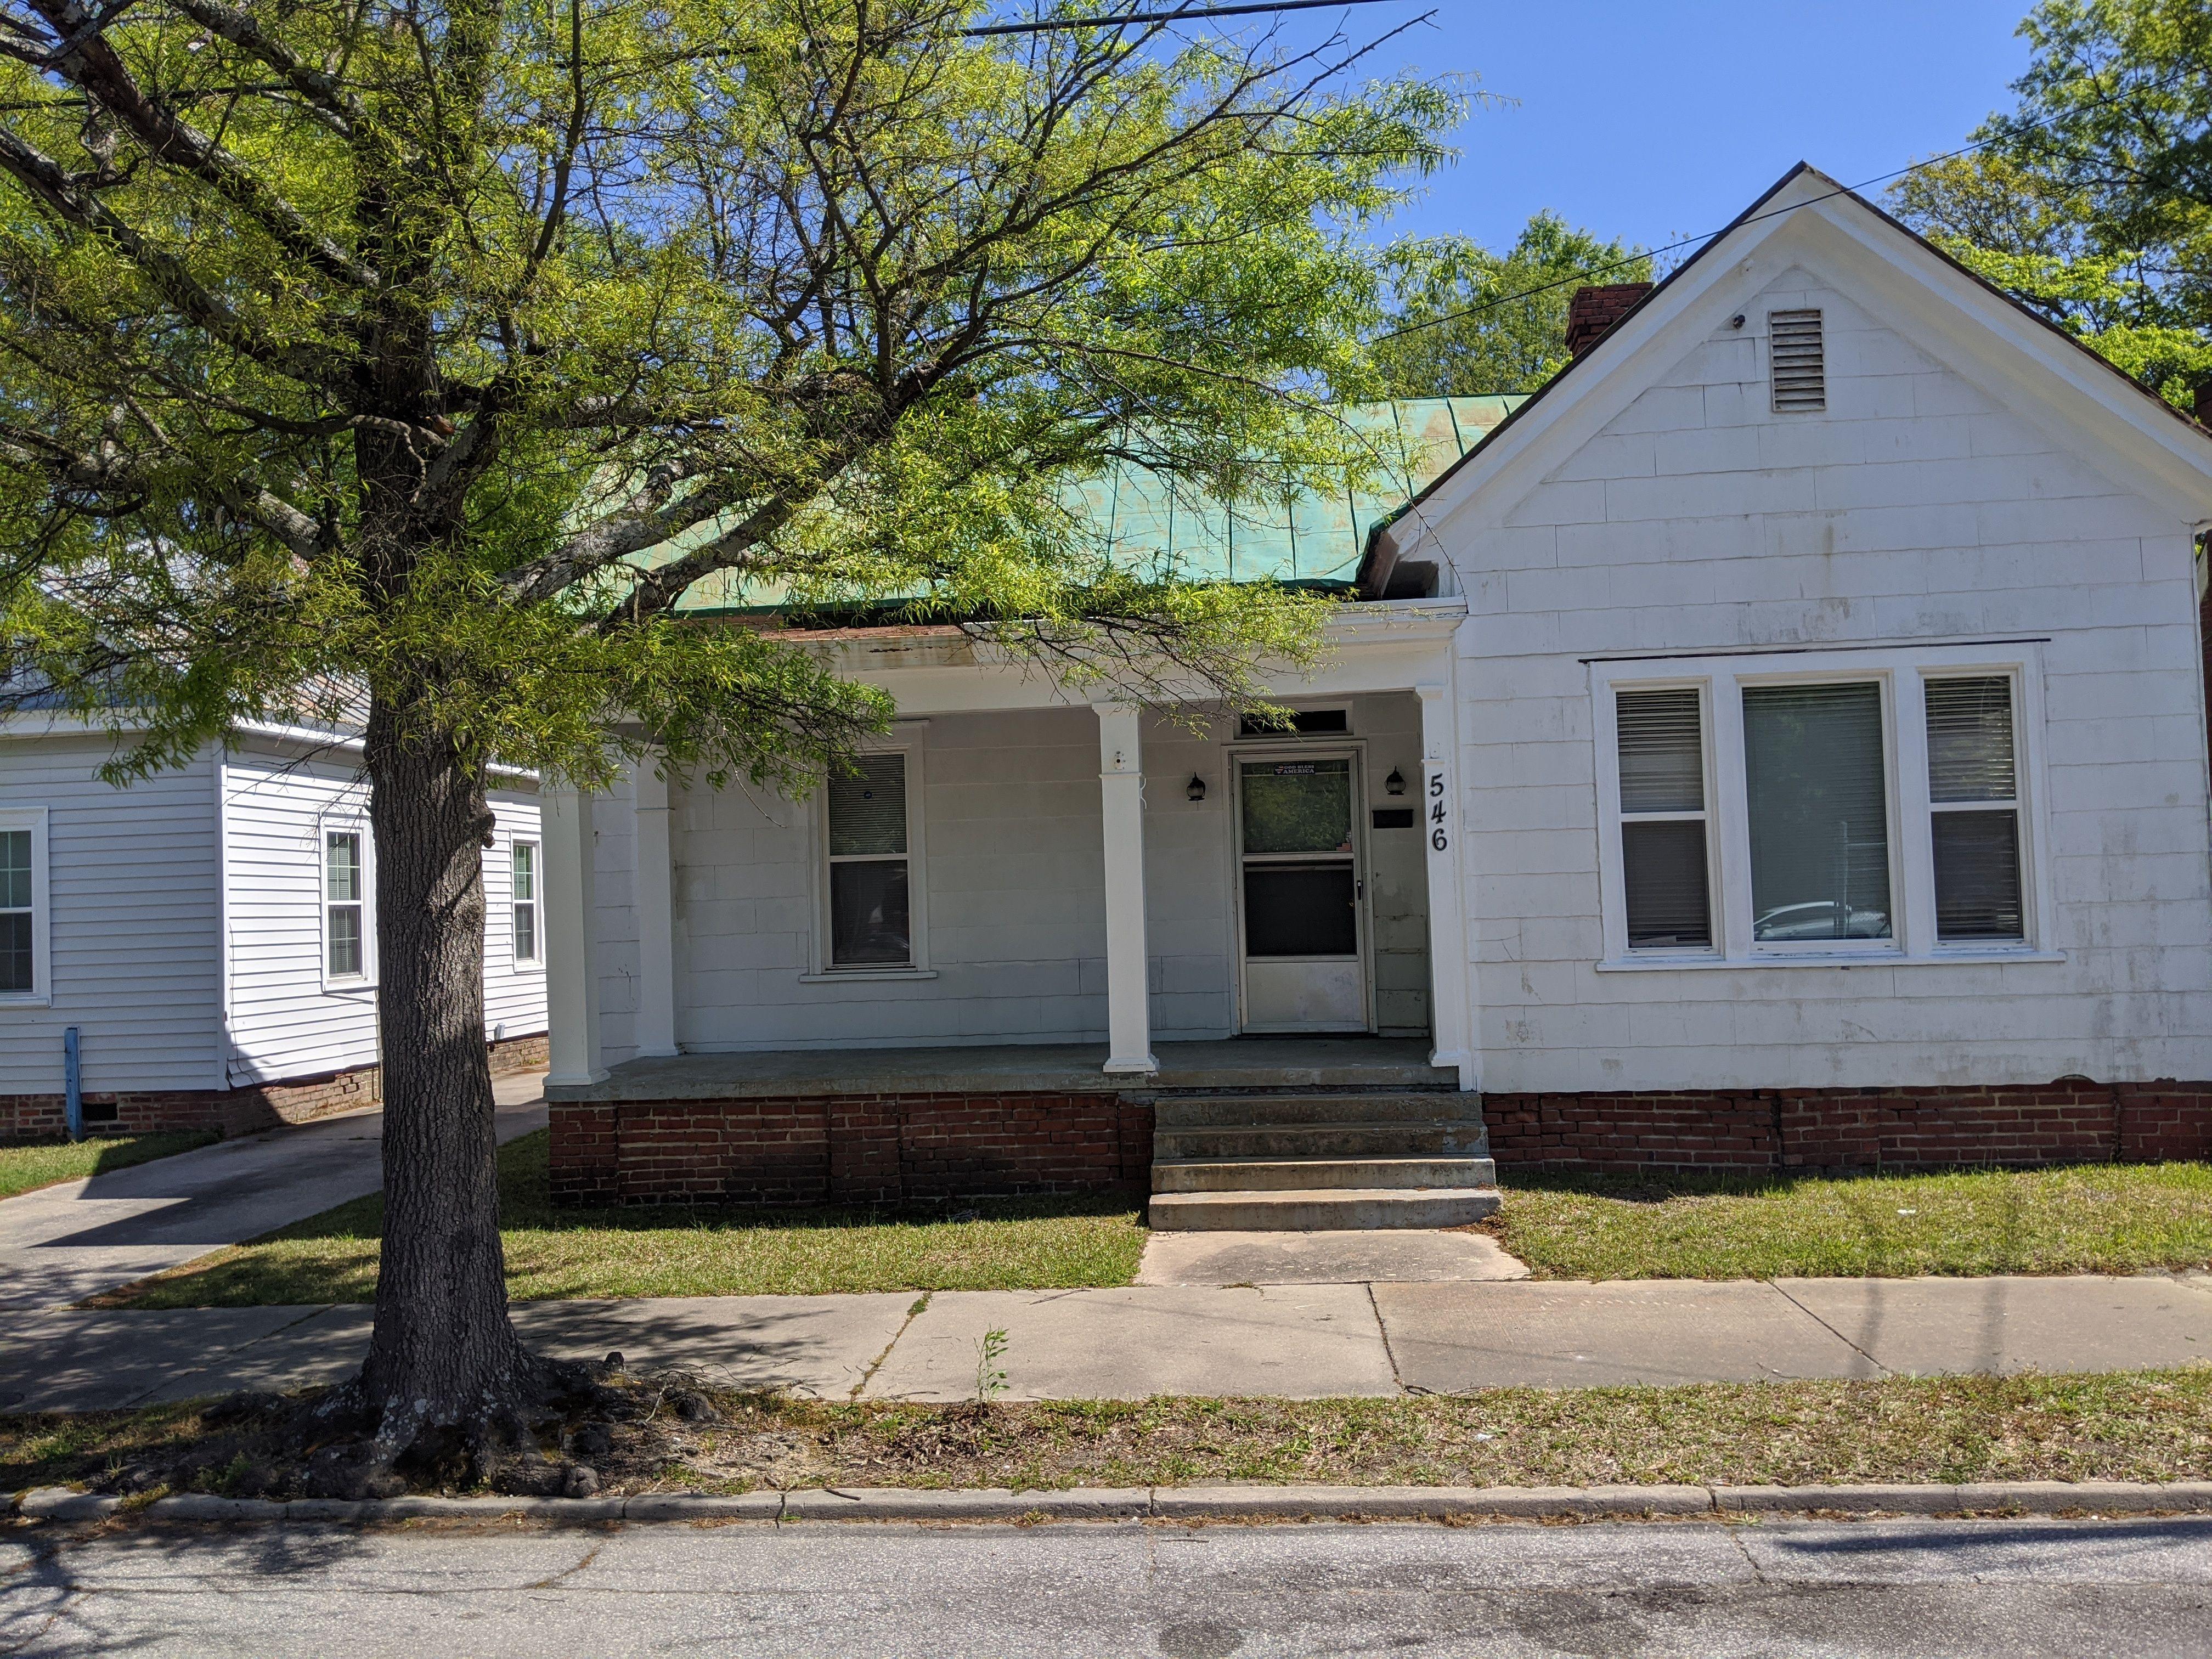 546 Marigold St, Rocky Mount, NC